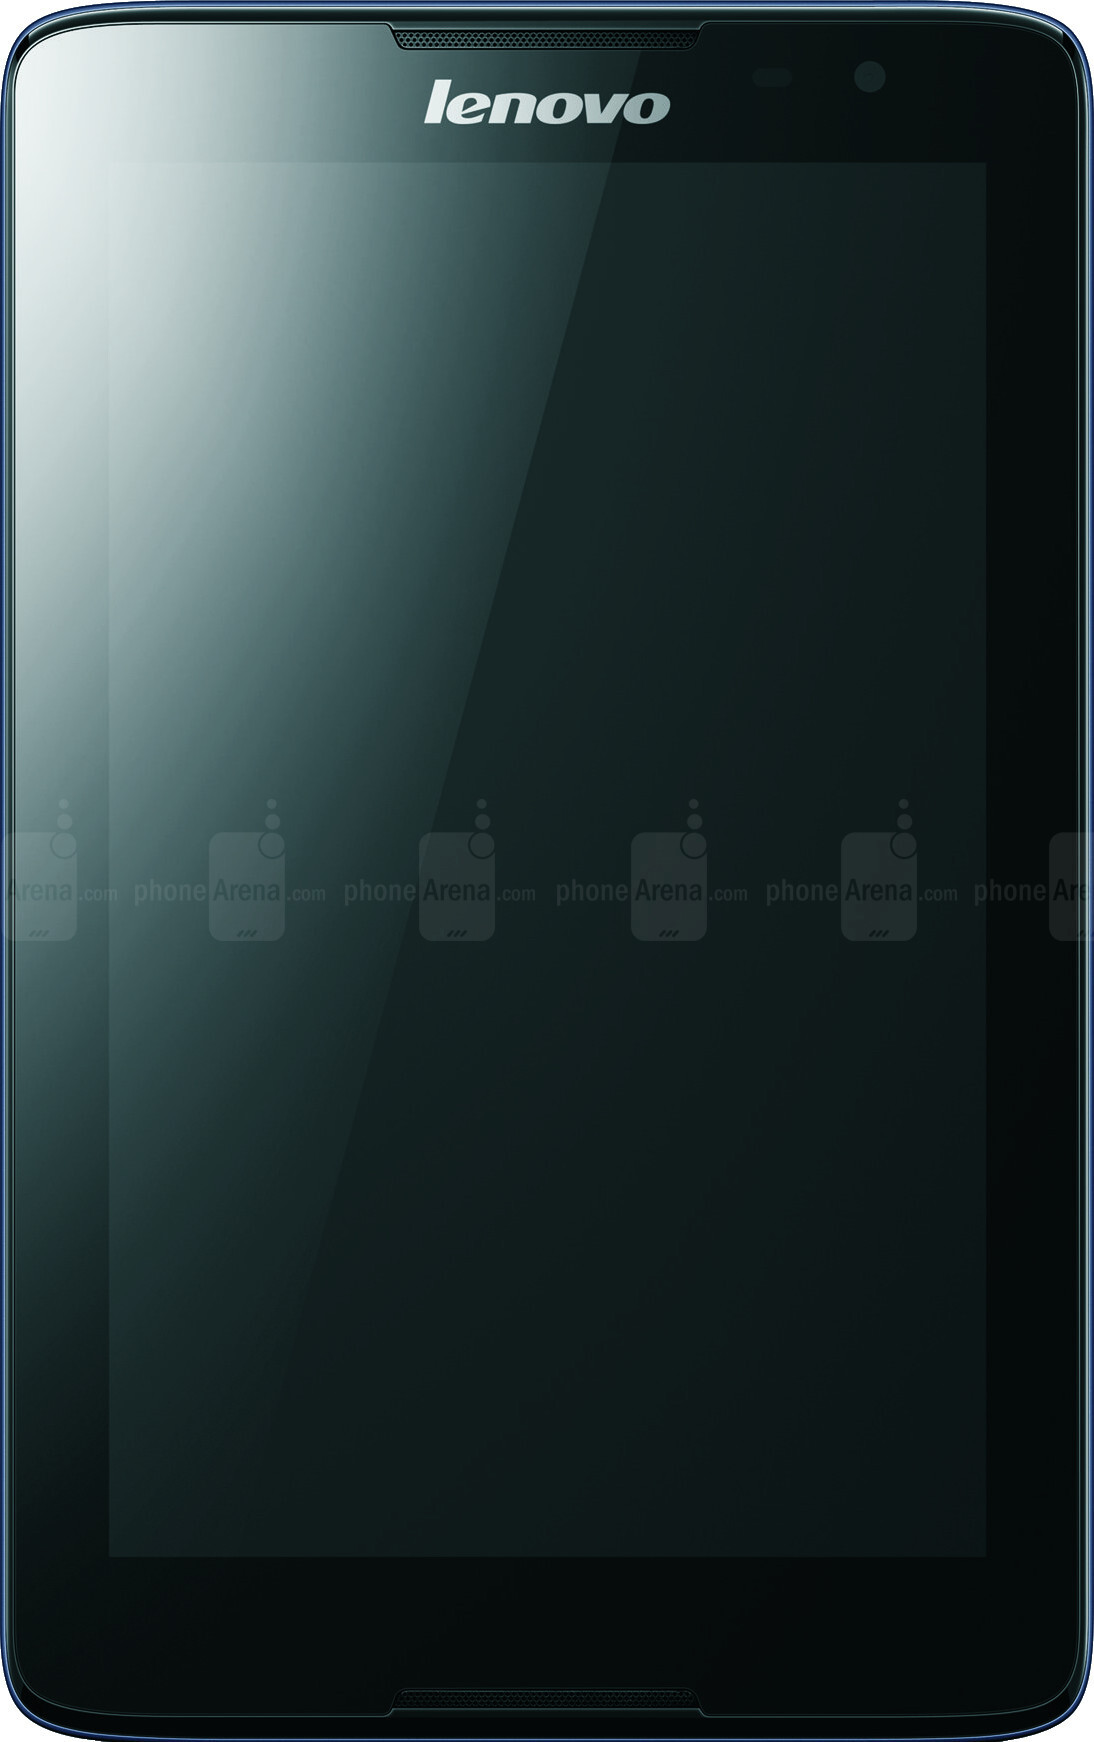 Lenovo Tab A8 vs Huawei MediaPad M1 - Visual phone size compare